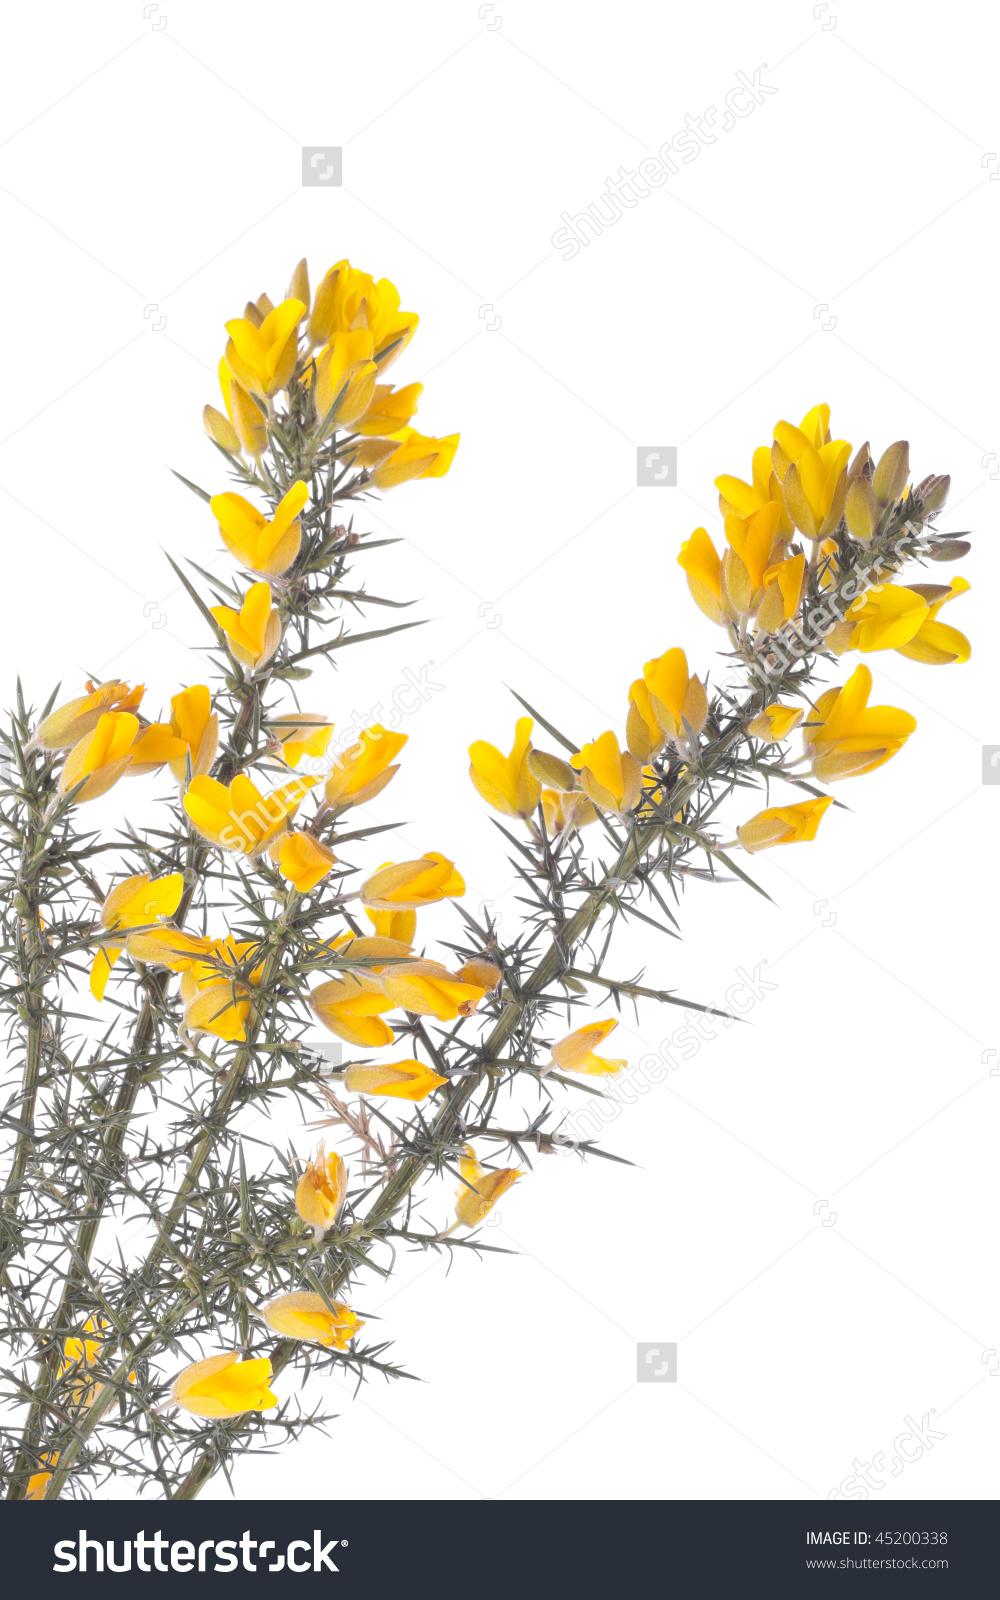 Yellow Gorse Flowers Shrub Isolated Over White Stock Photo.